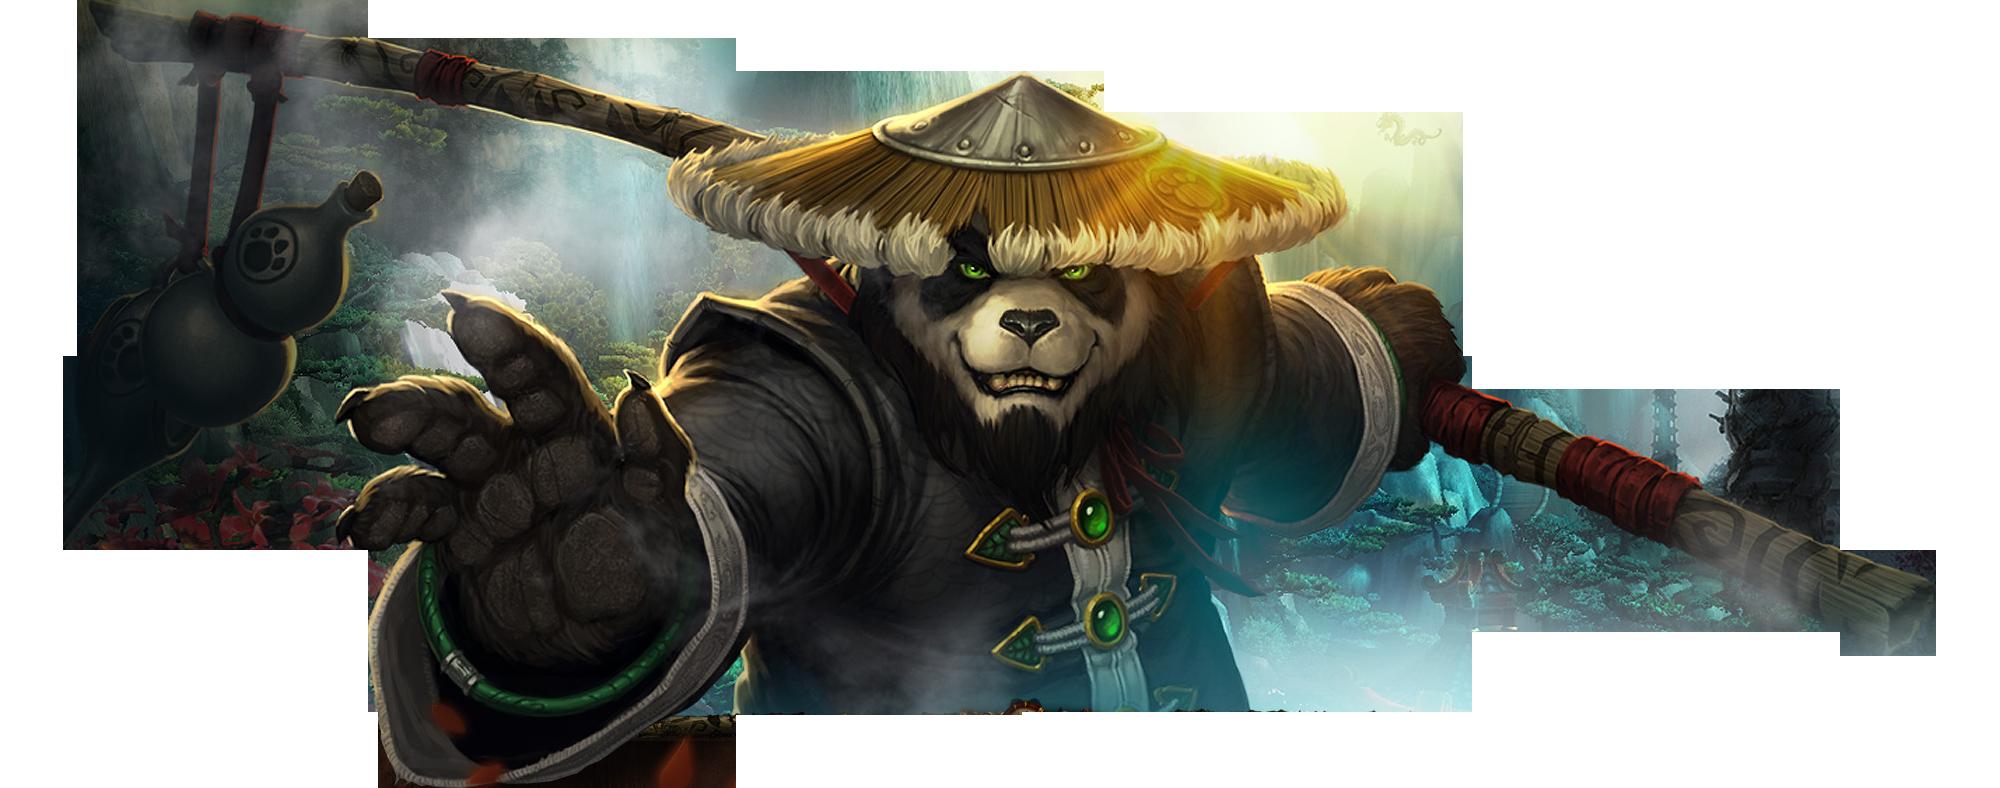 Warcraft PNG images free download.